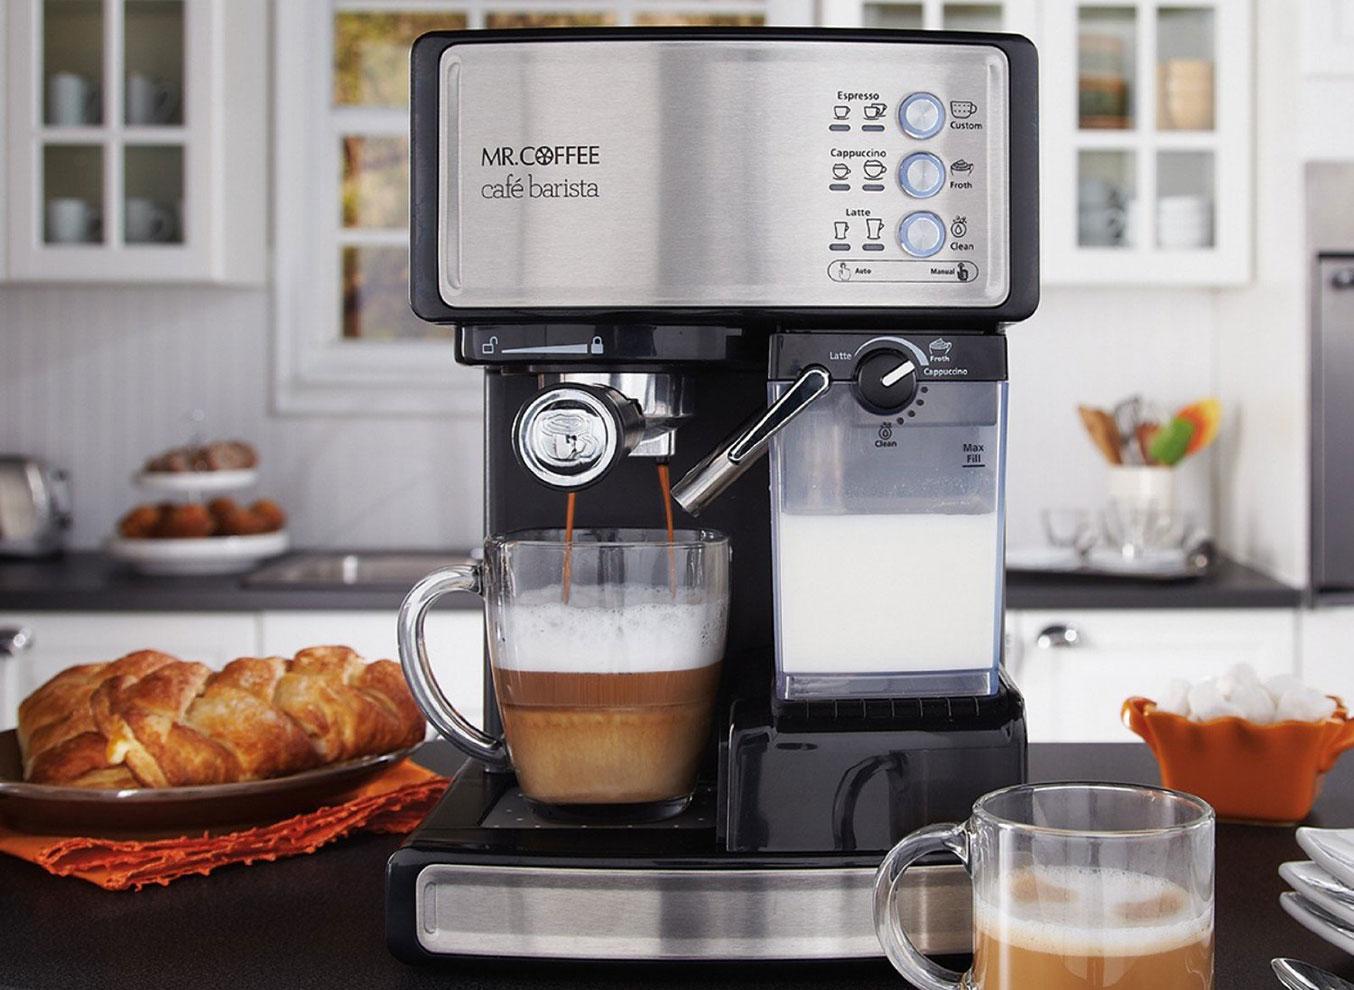 Mr. Coffee Cafe Barista Espresso Maker | Best Espresso Machines